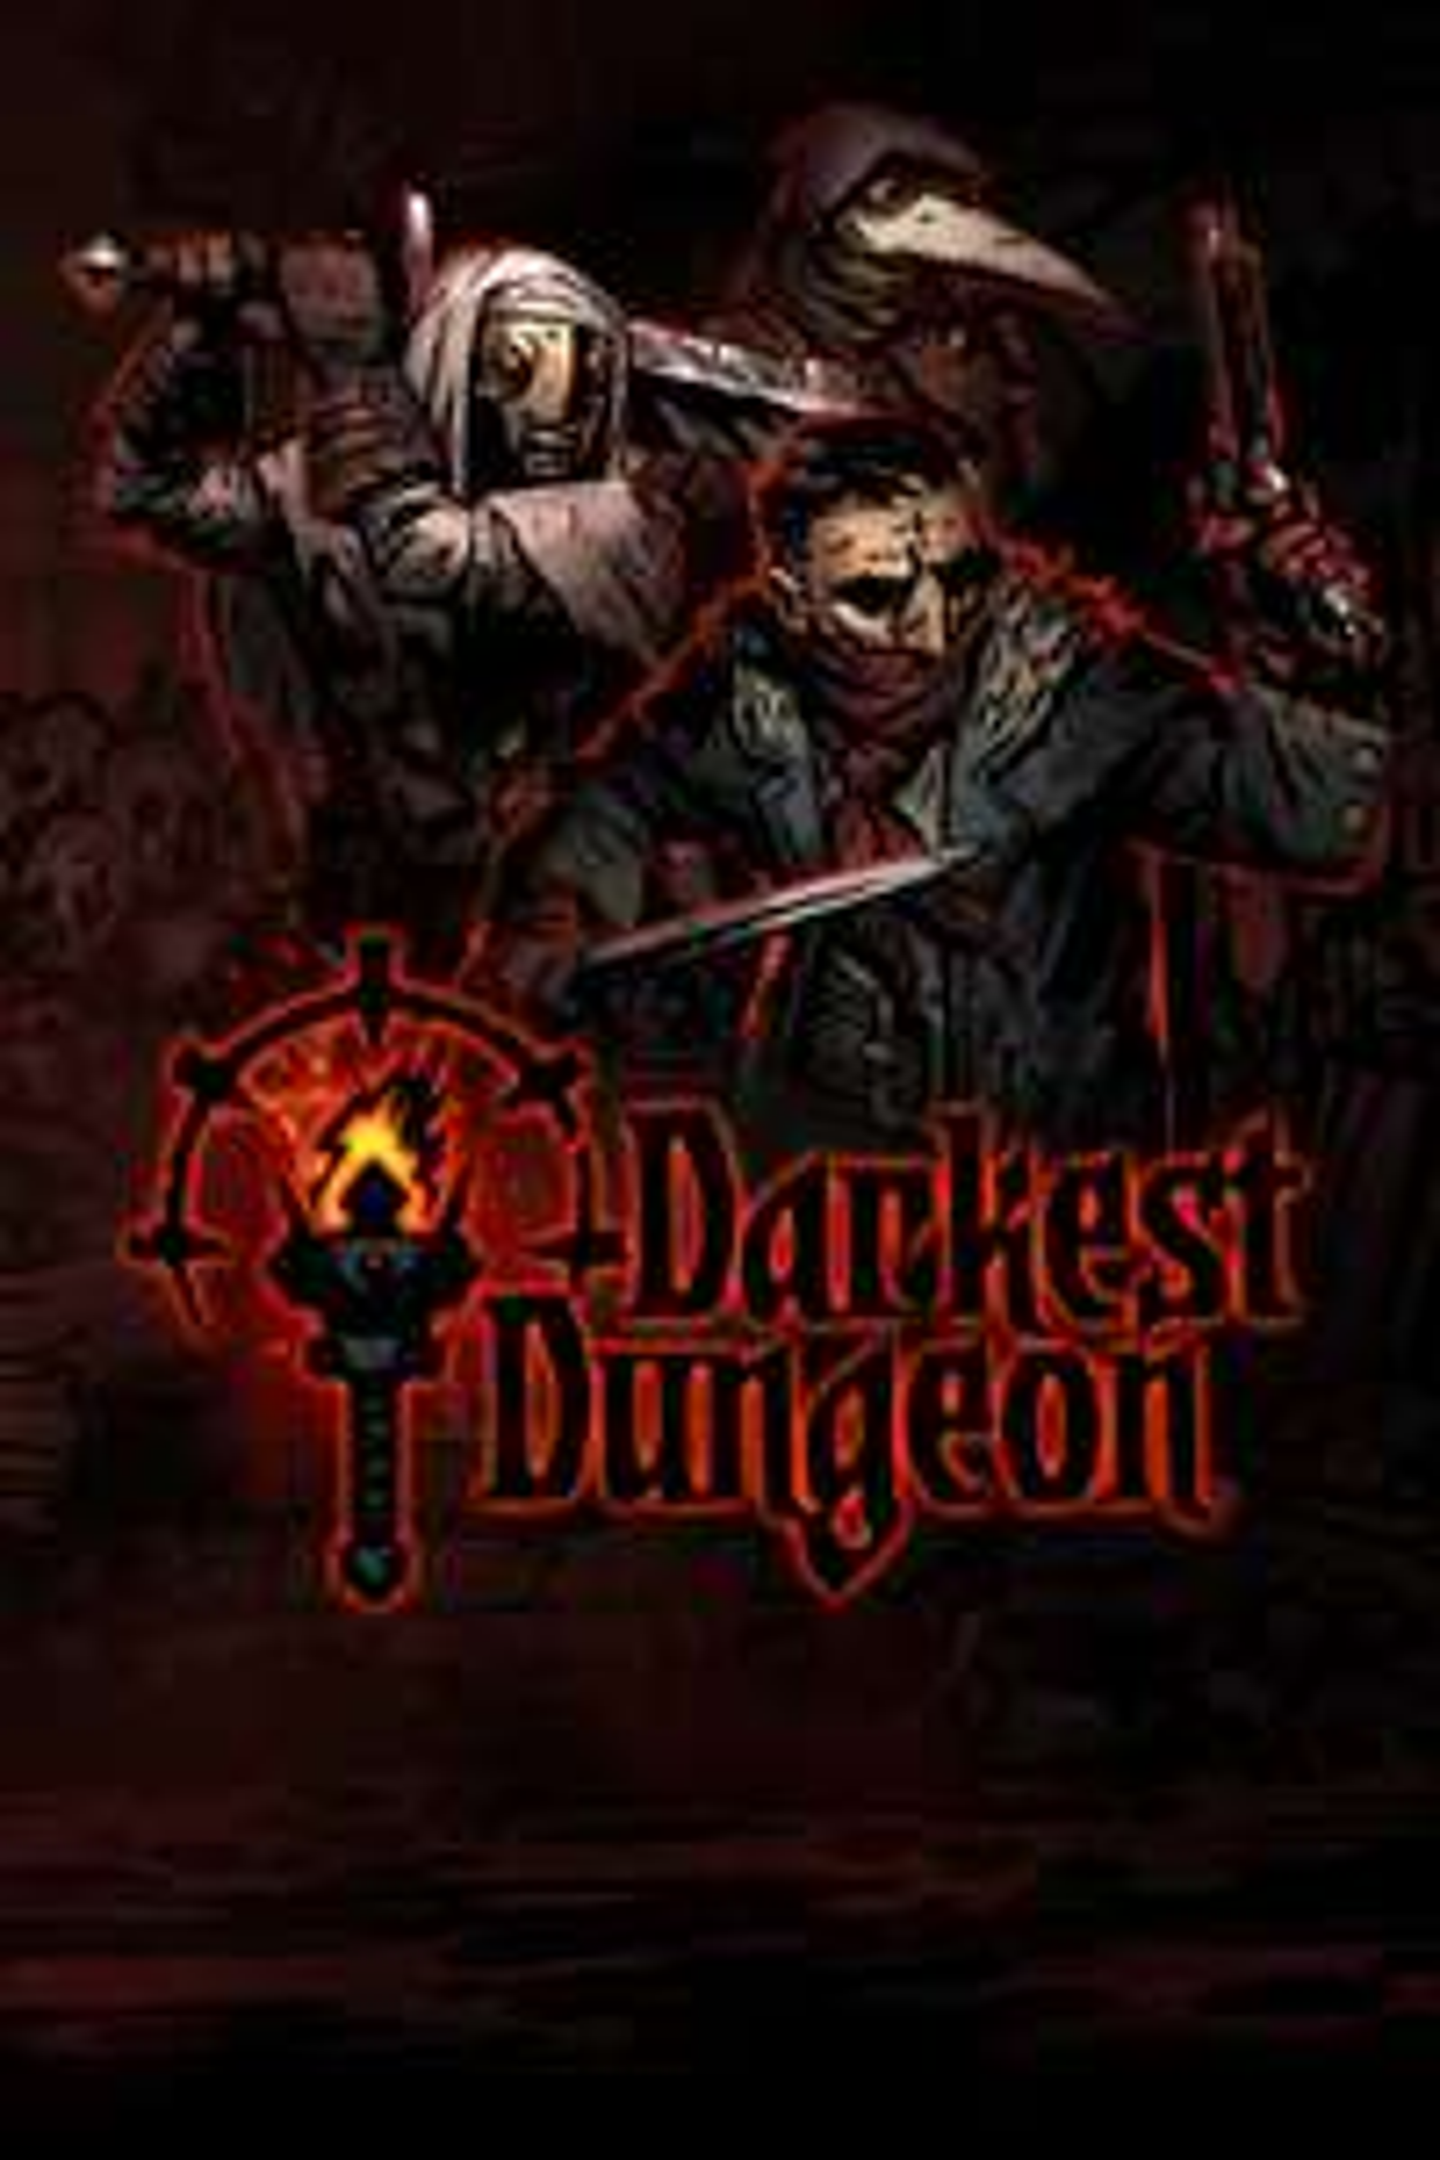 GRATIS Darkest Dungeon op Epic Games vanaf 17 uur Plus (DLC Darkest Dungeon: The Musketeer)